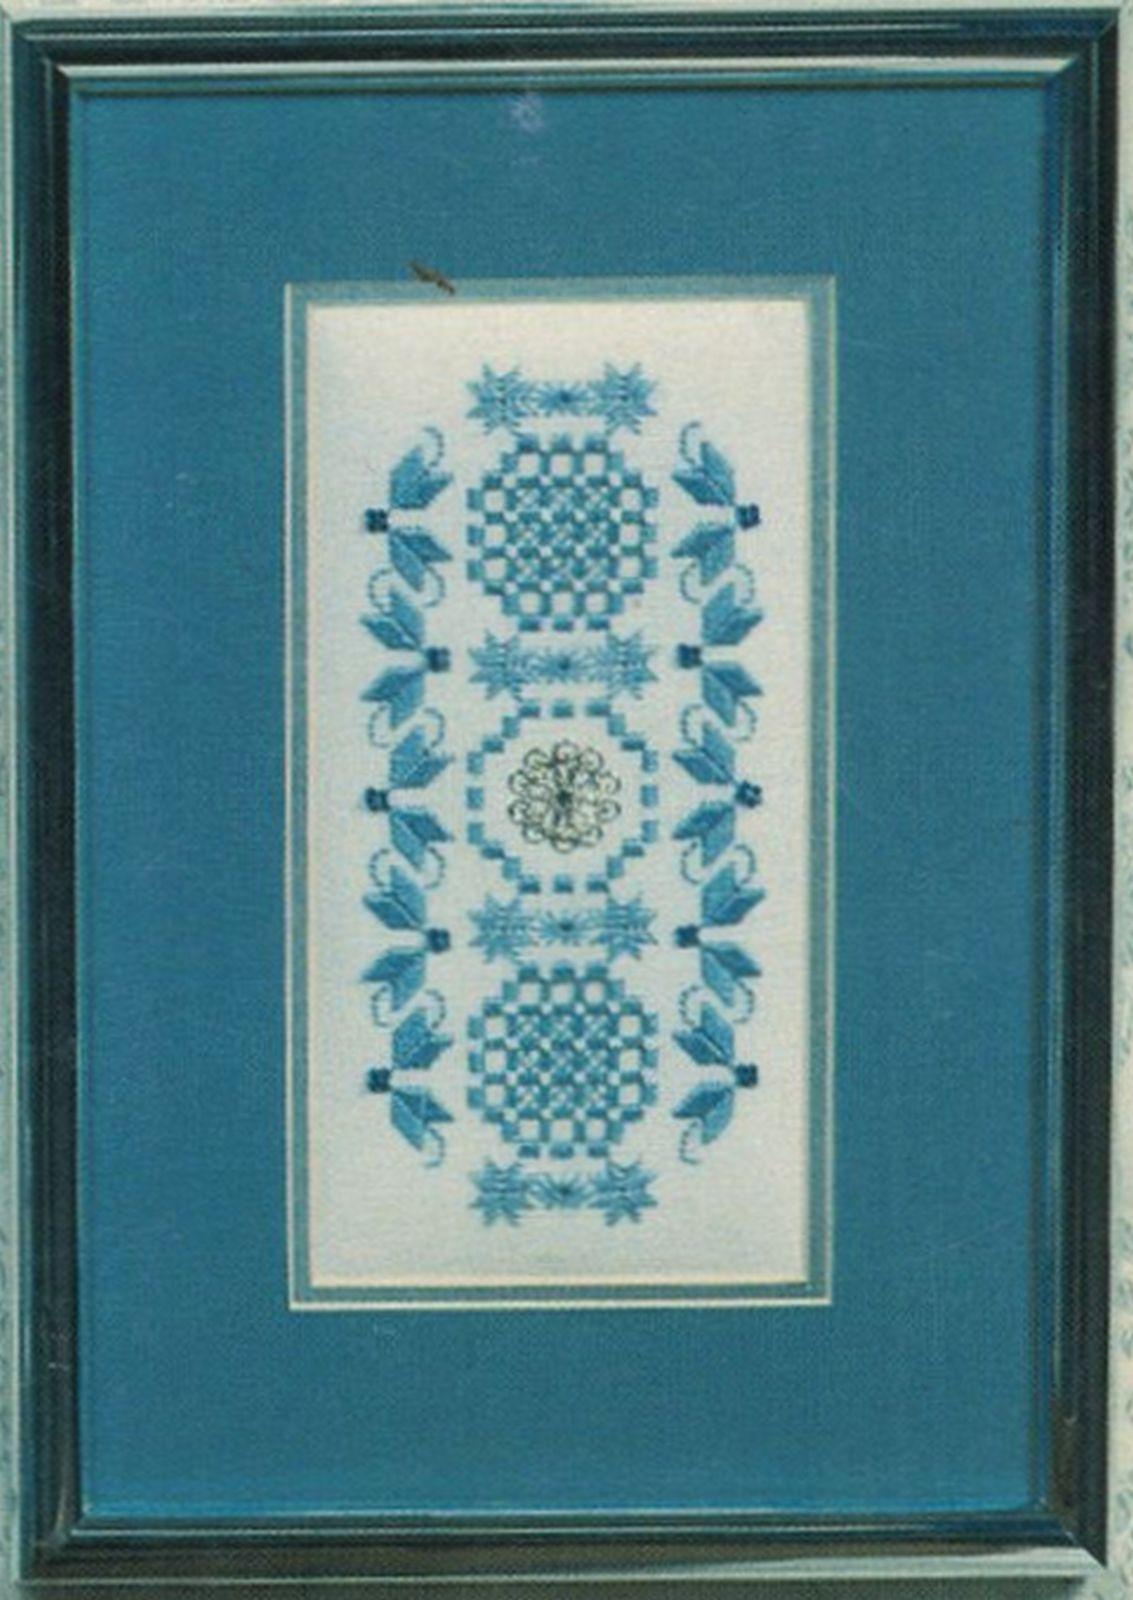 I Love Winter Hardanger Embroidery Seasonal Sampler Rosalyn Watnemo Book image 4